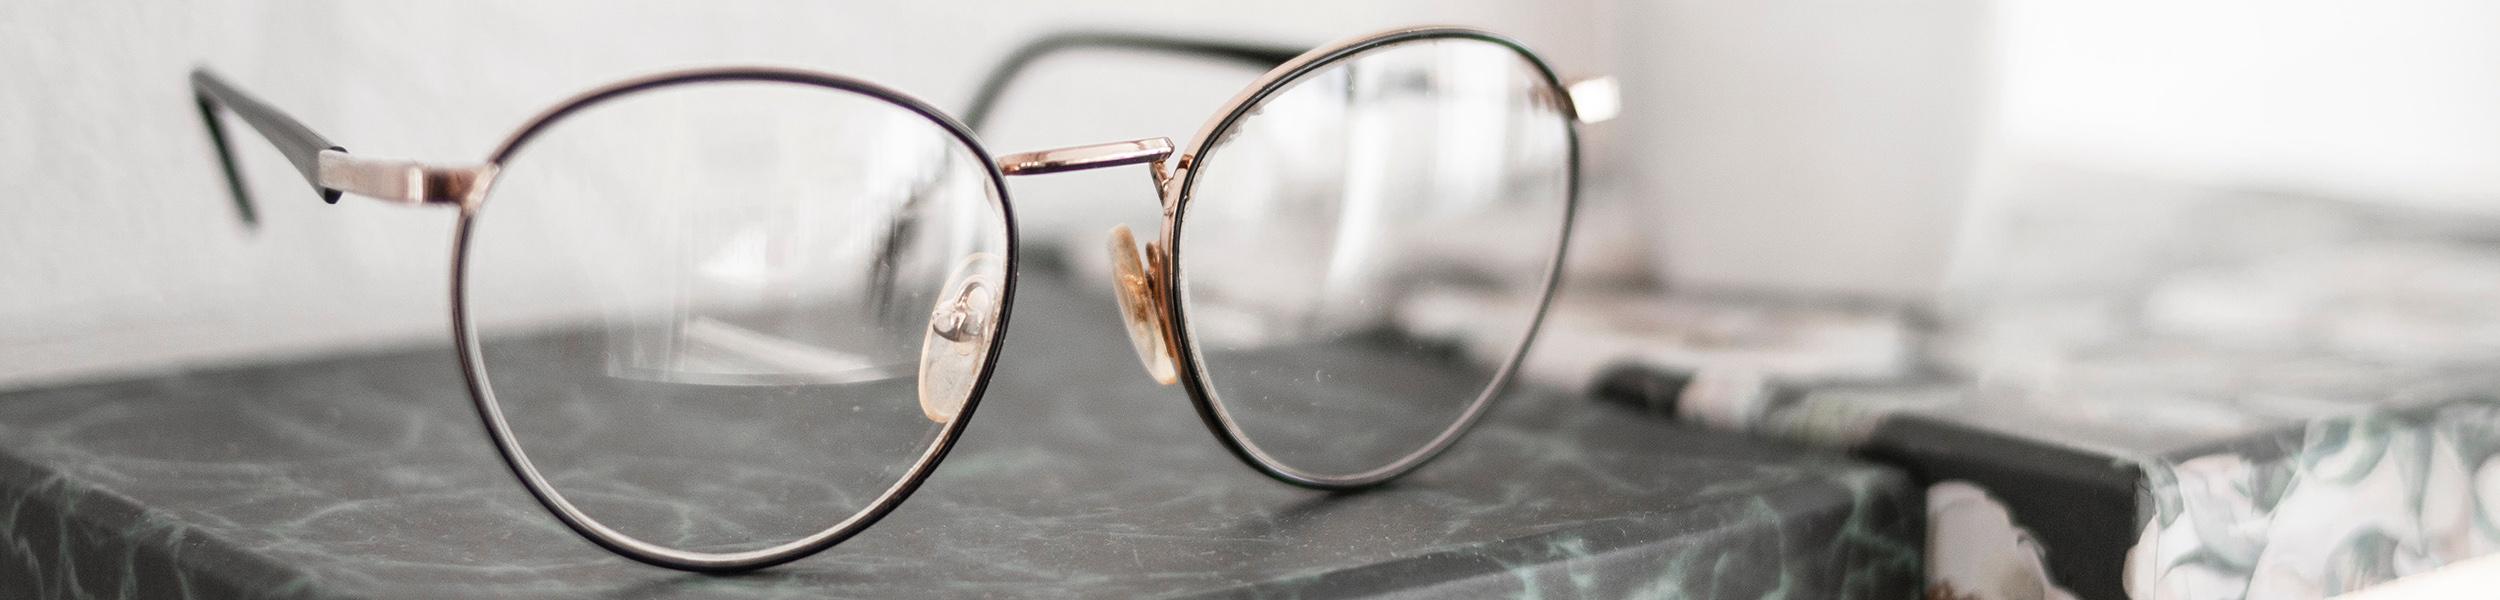 Glasses IND copy